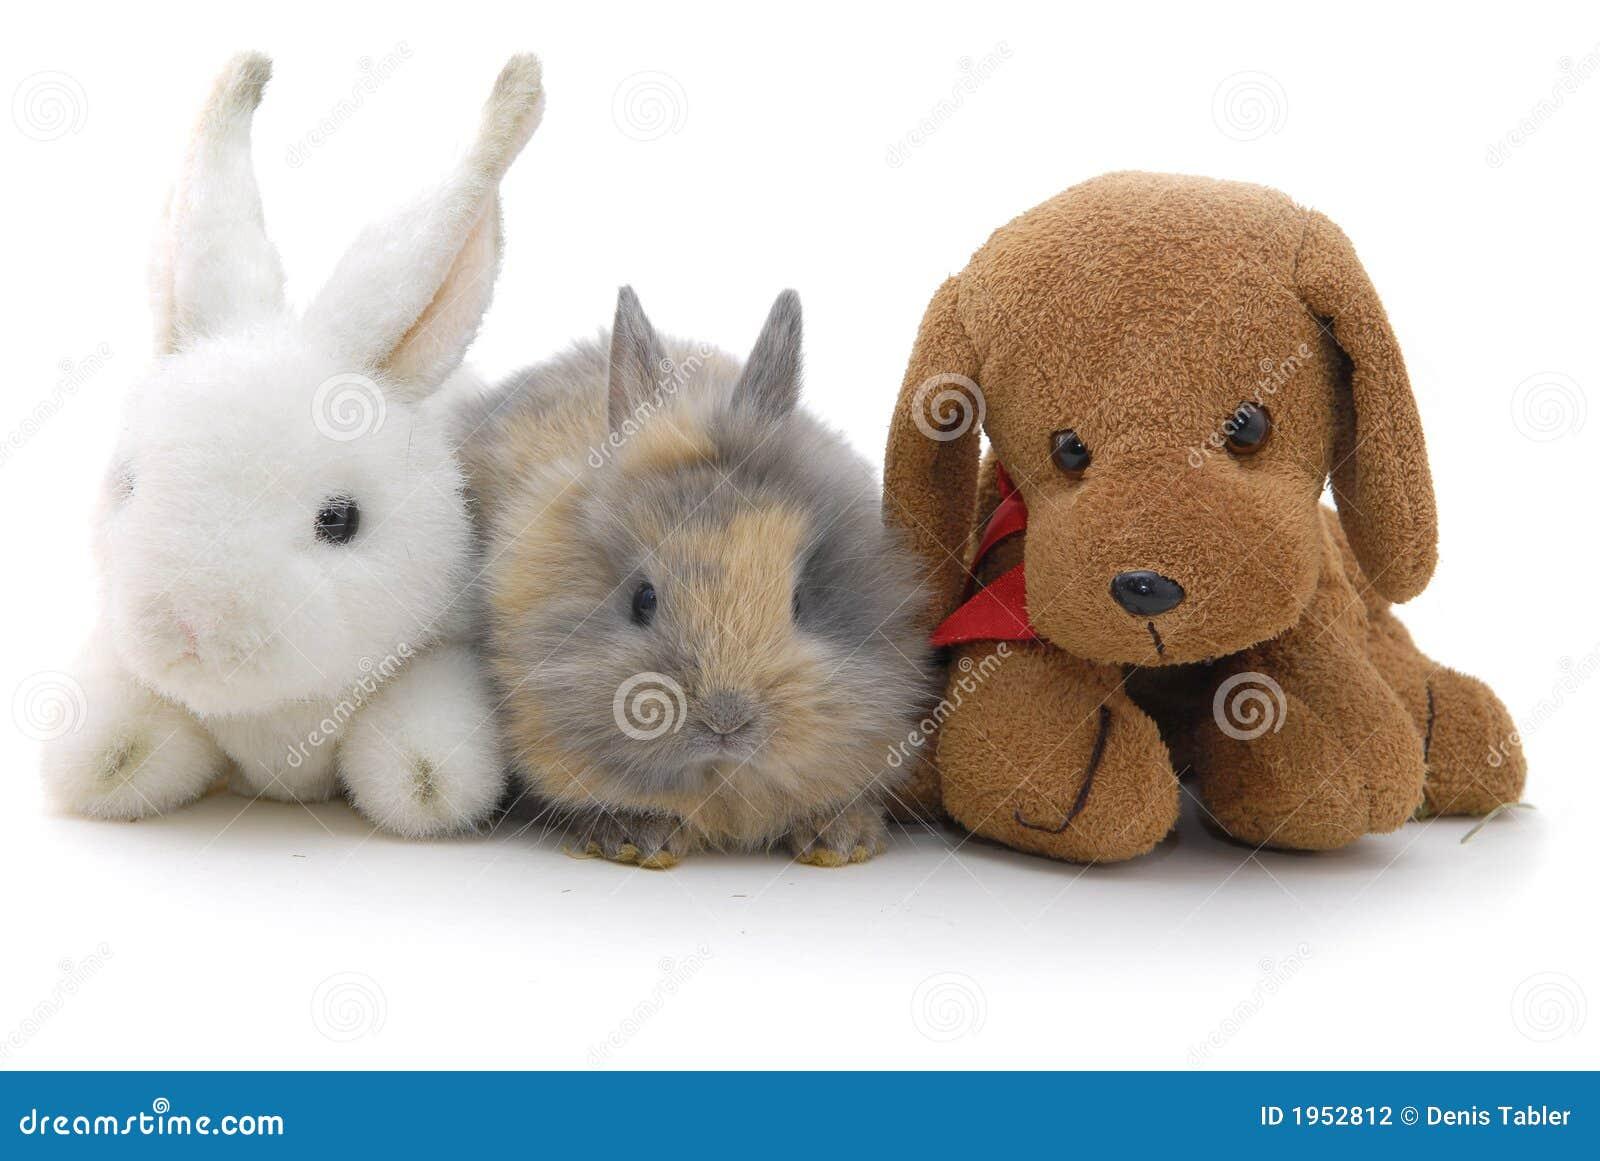 Small Toy Rabbits : Rabbit toys stock image cartoondealer